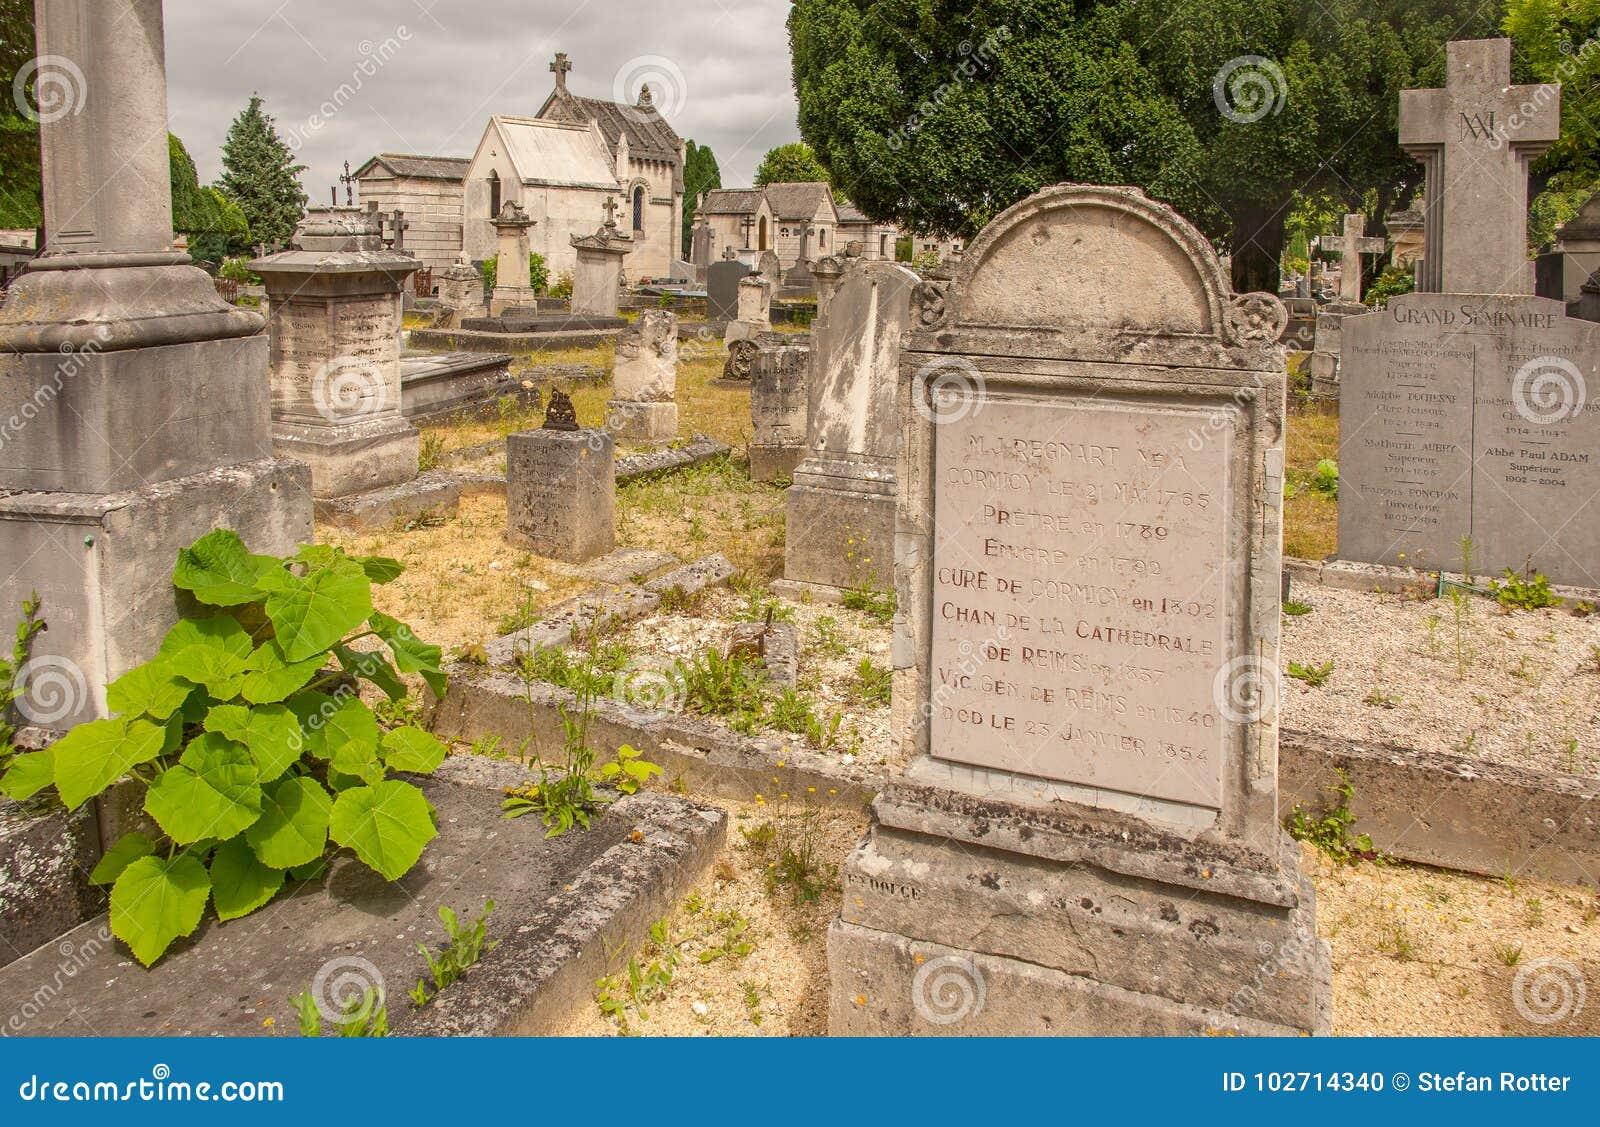 Grób w cmentarzu Cimetiere Du Nord w Reims